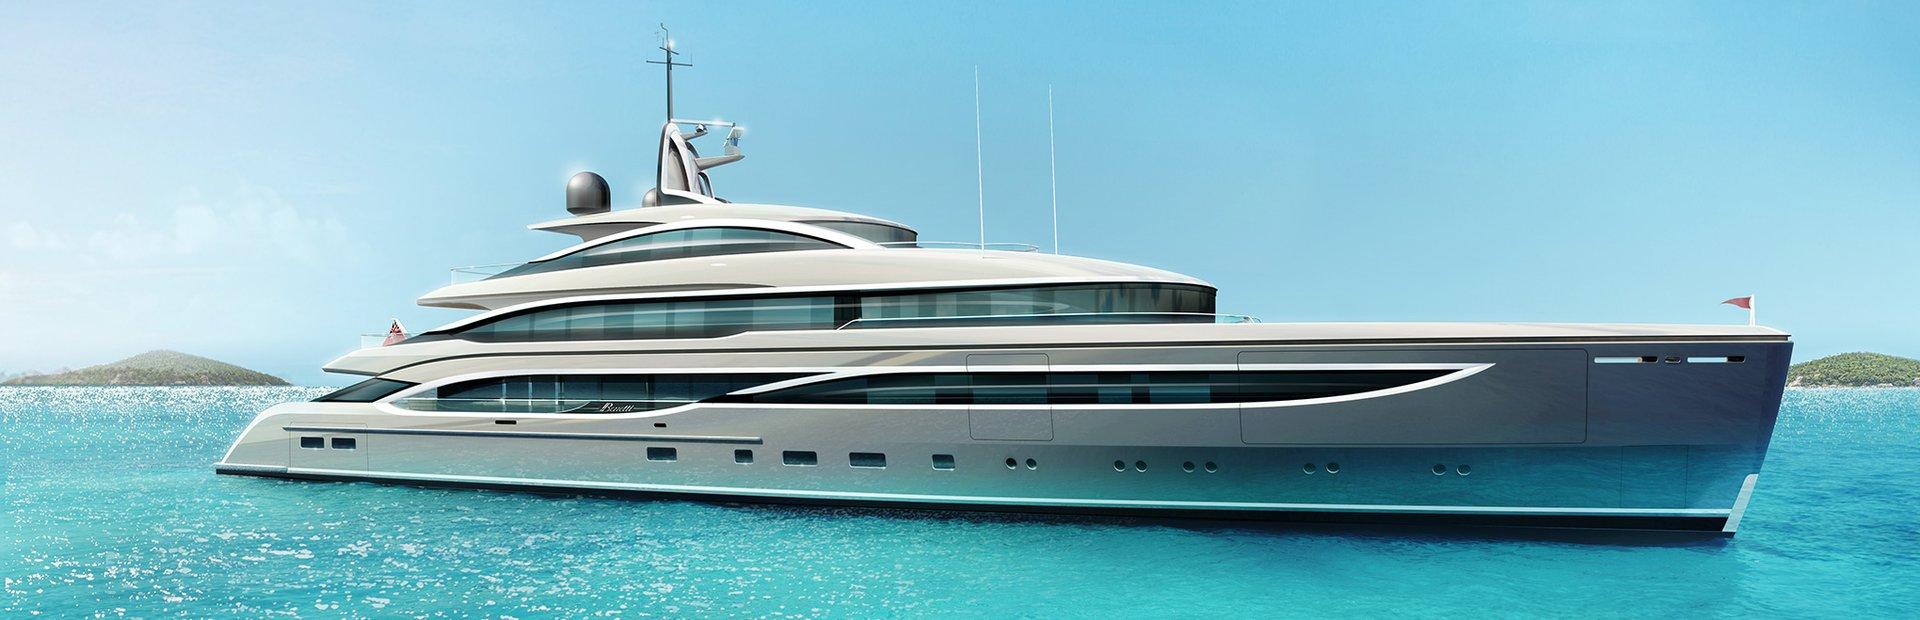 B.Now 63M Yacht Charter